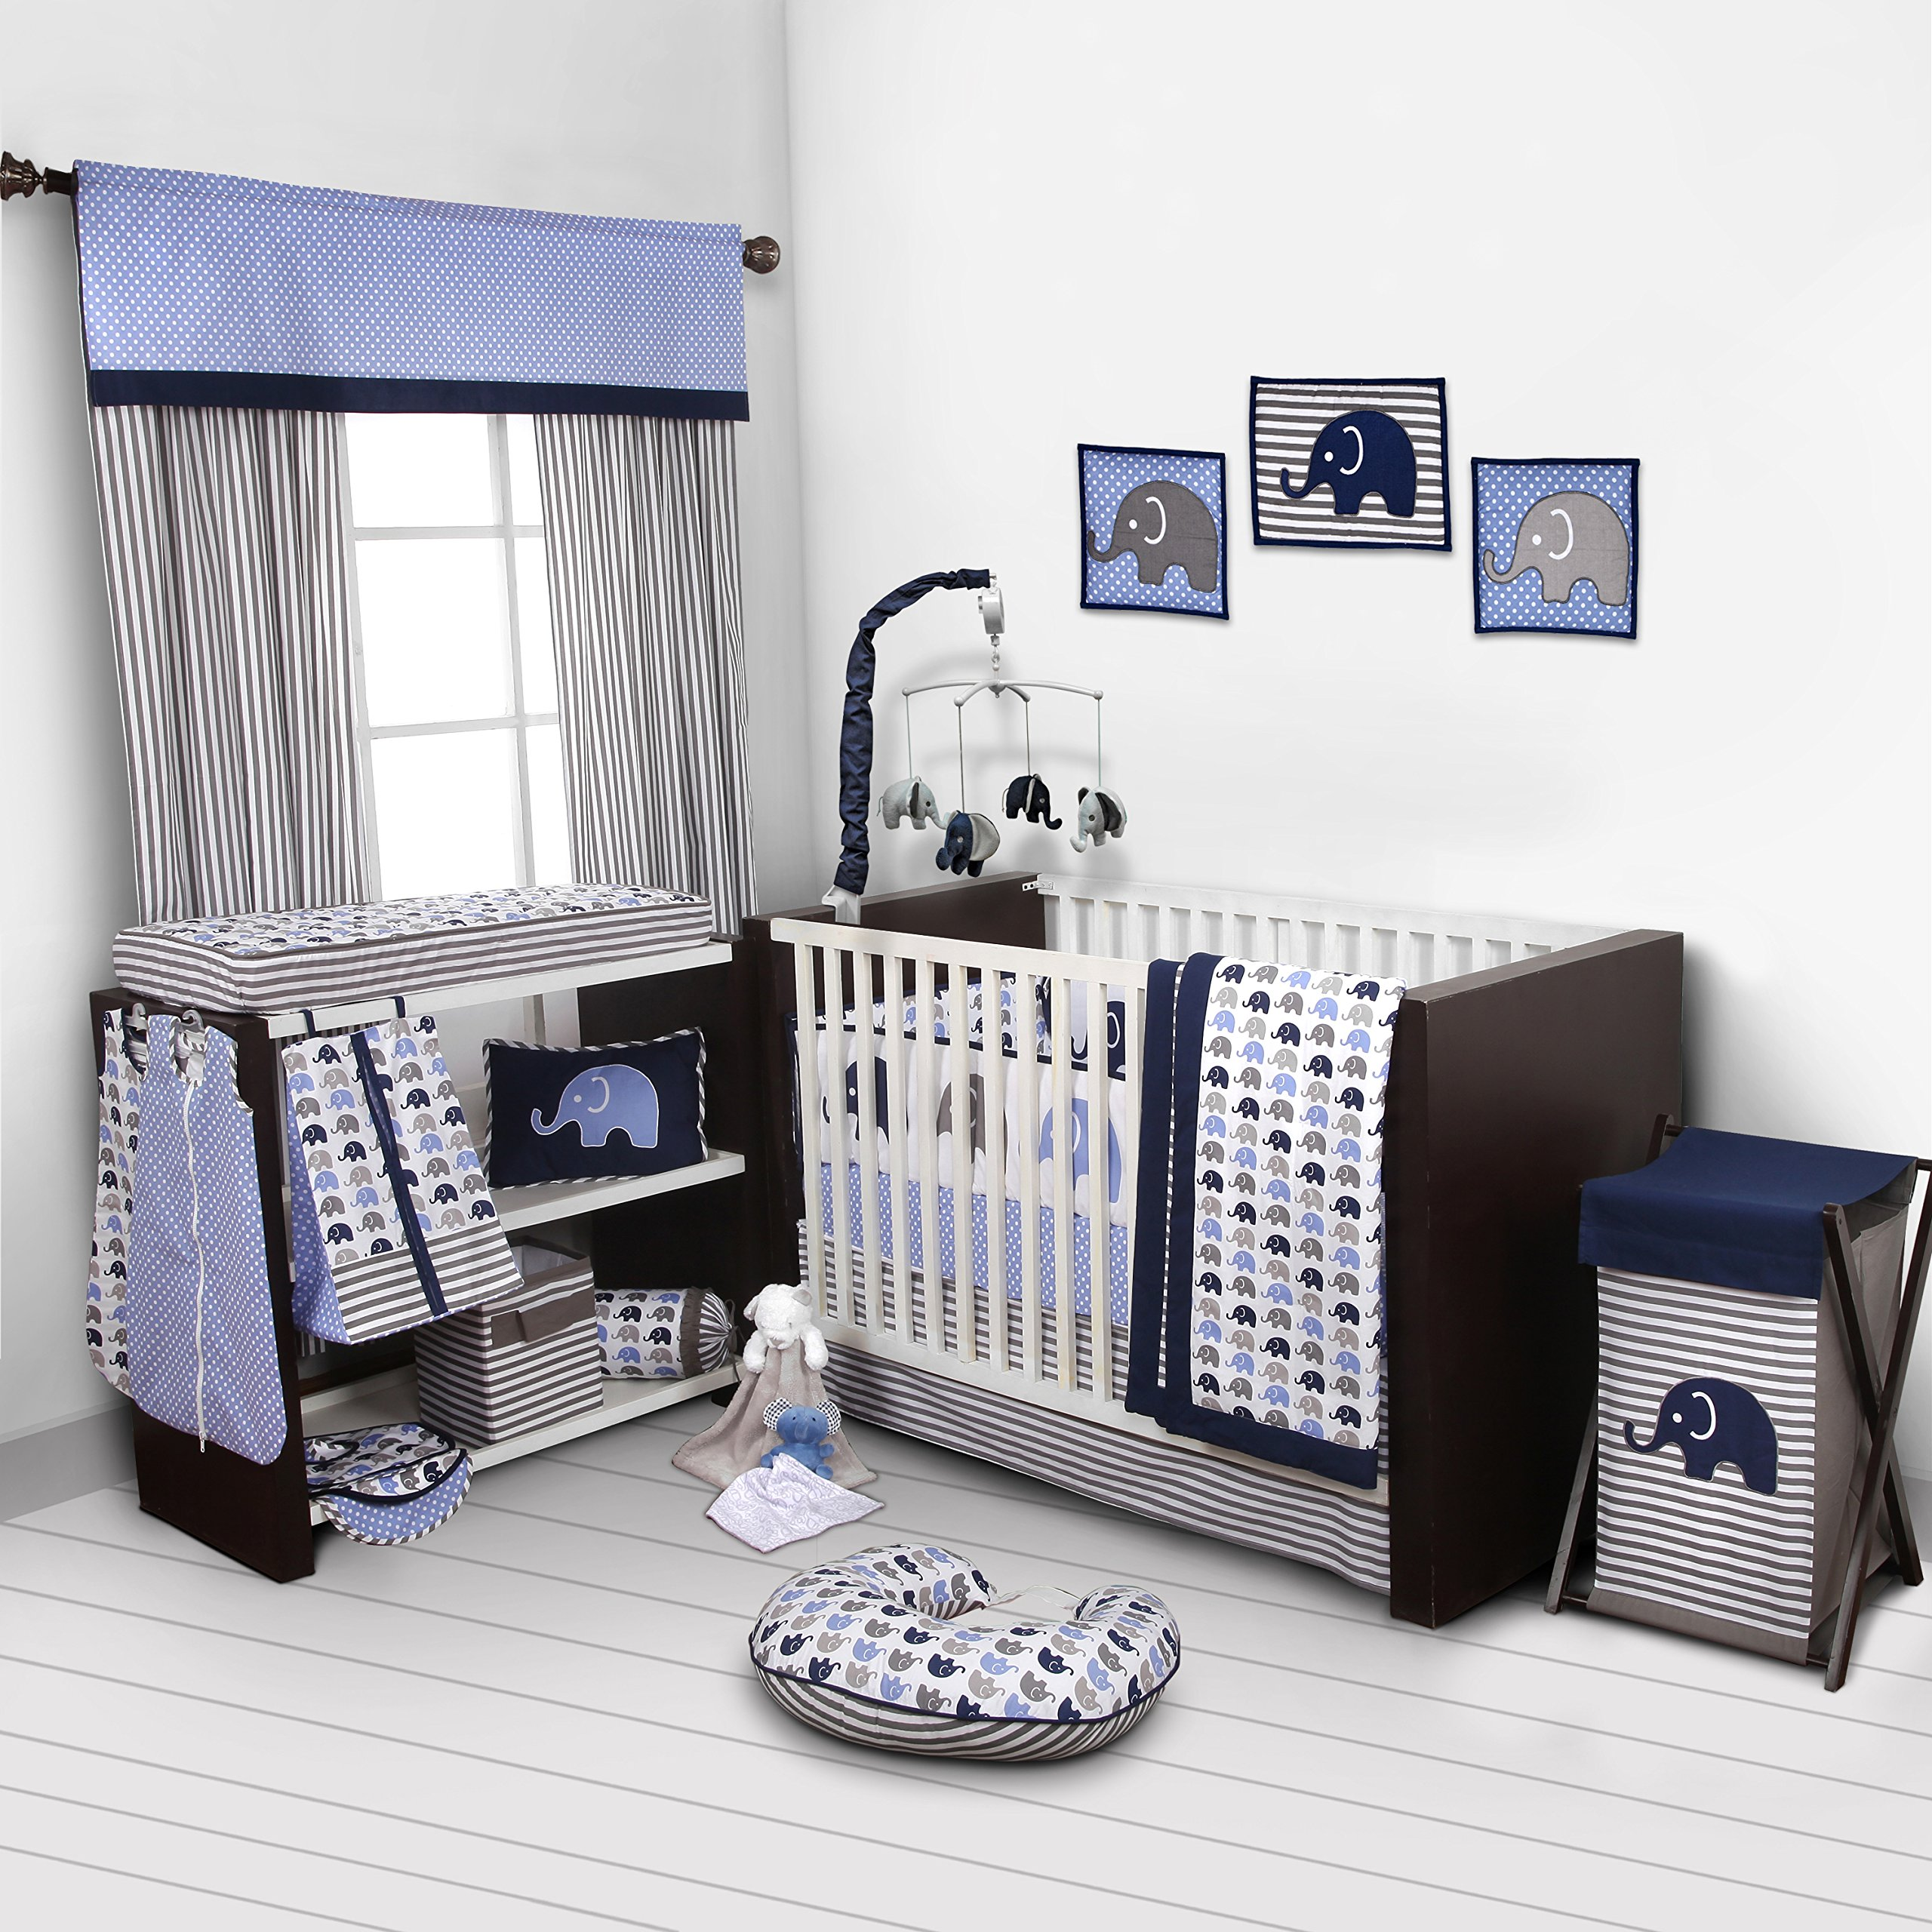 Elephants Blue/Grey 10 pc Crib Set Including Bumper Pad by Bacati